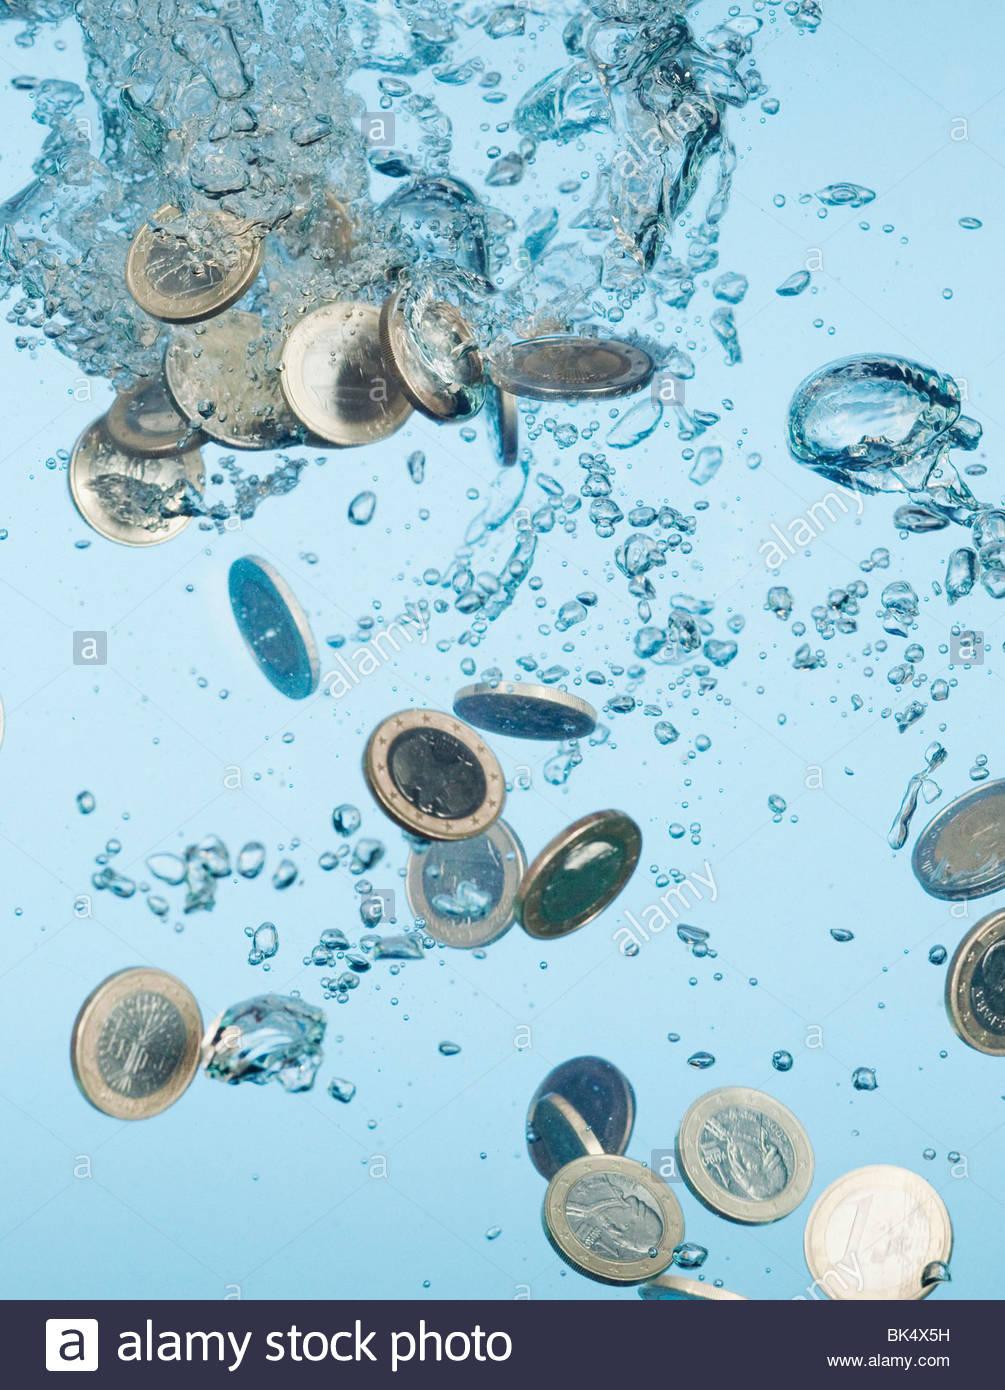 Close up of Euro coins splashing in water - Stock Image